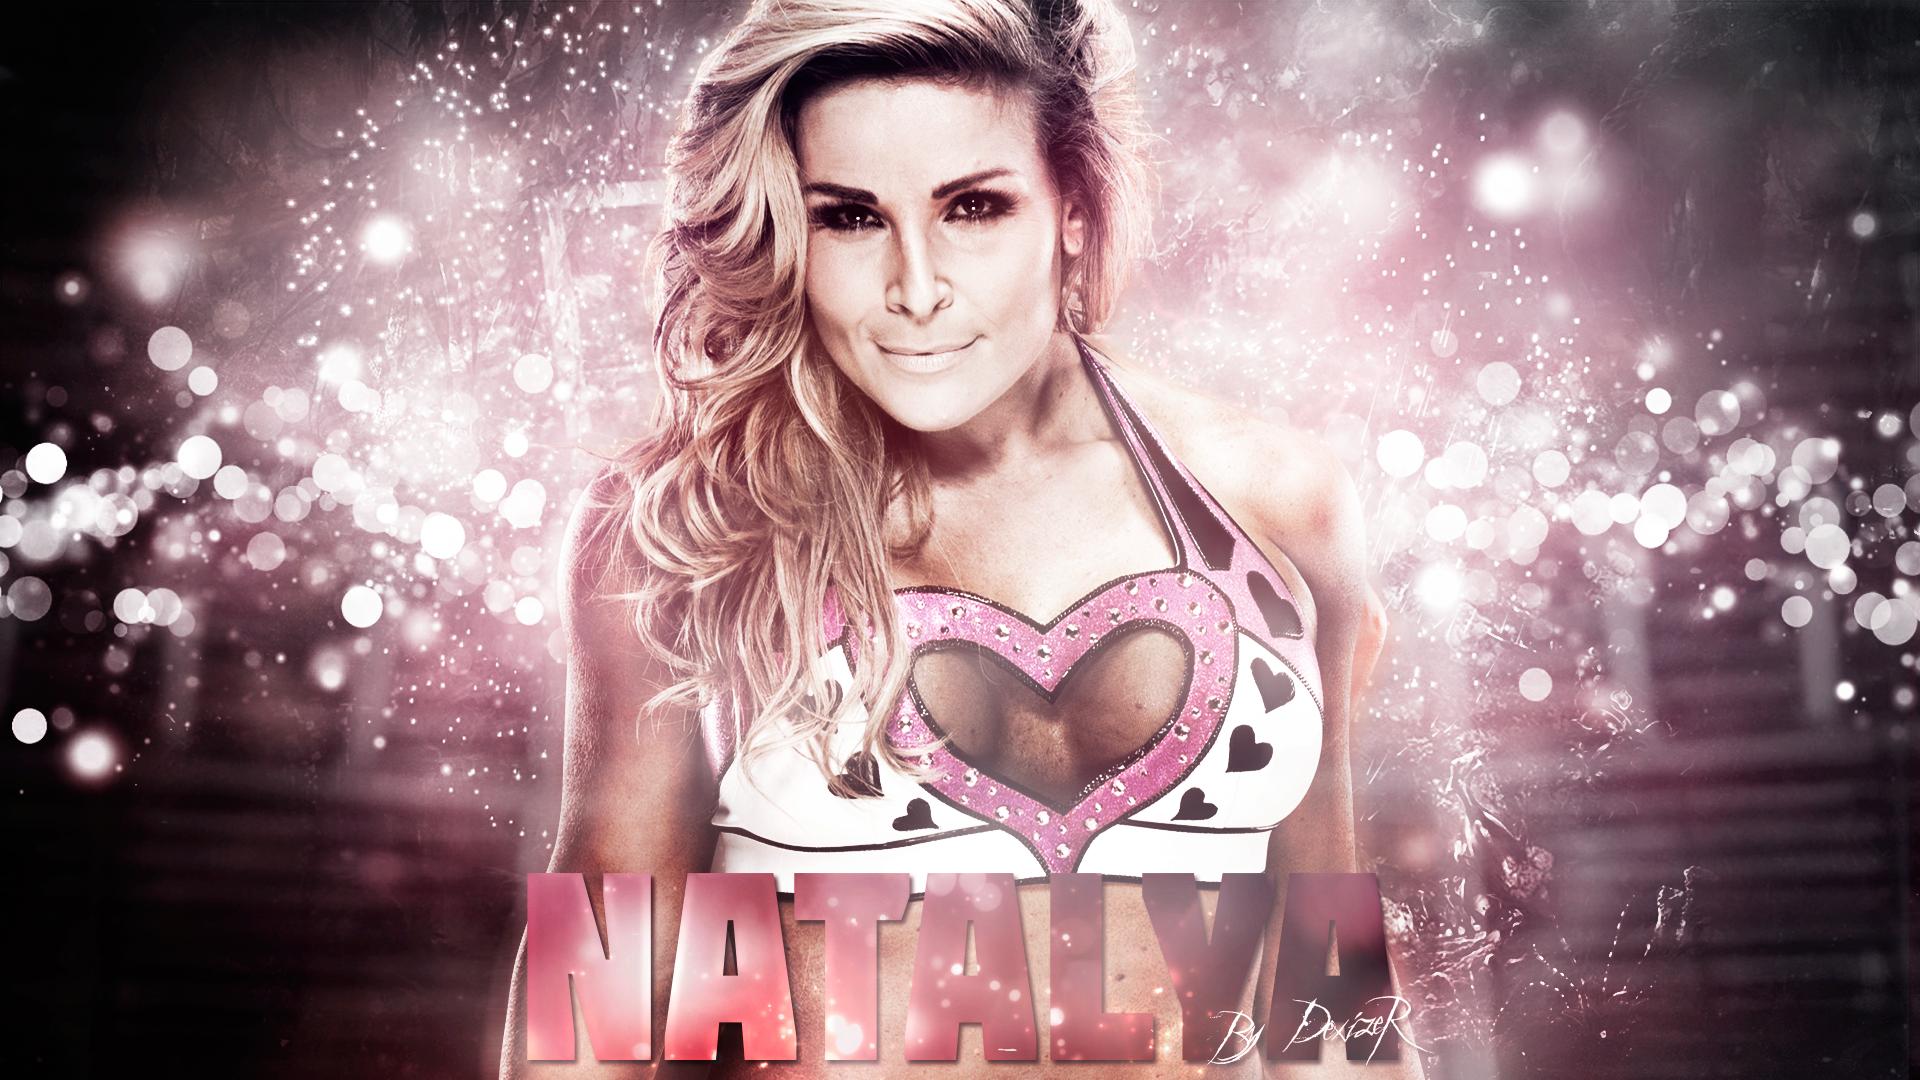 WWE Natalya HD Wallpaper 2015 By SmileDexizeR On DeviantArt